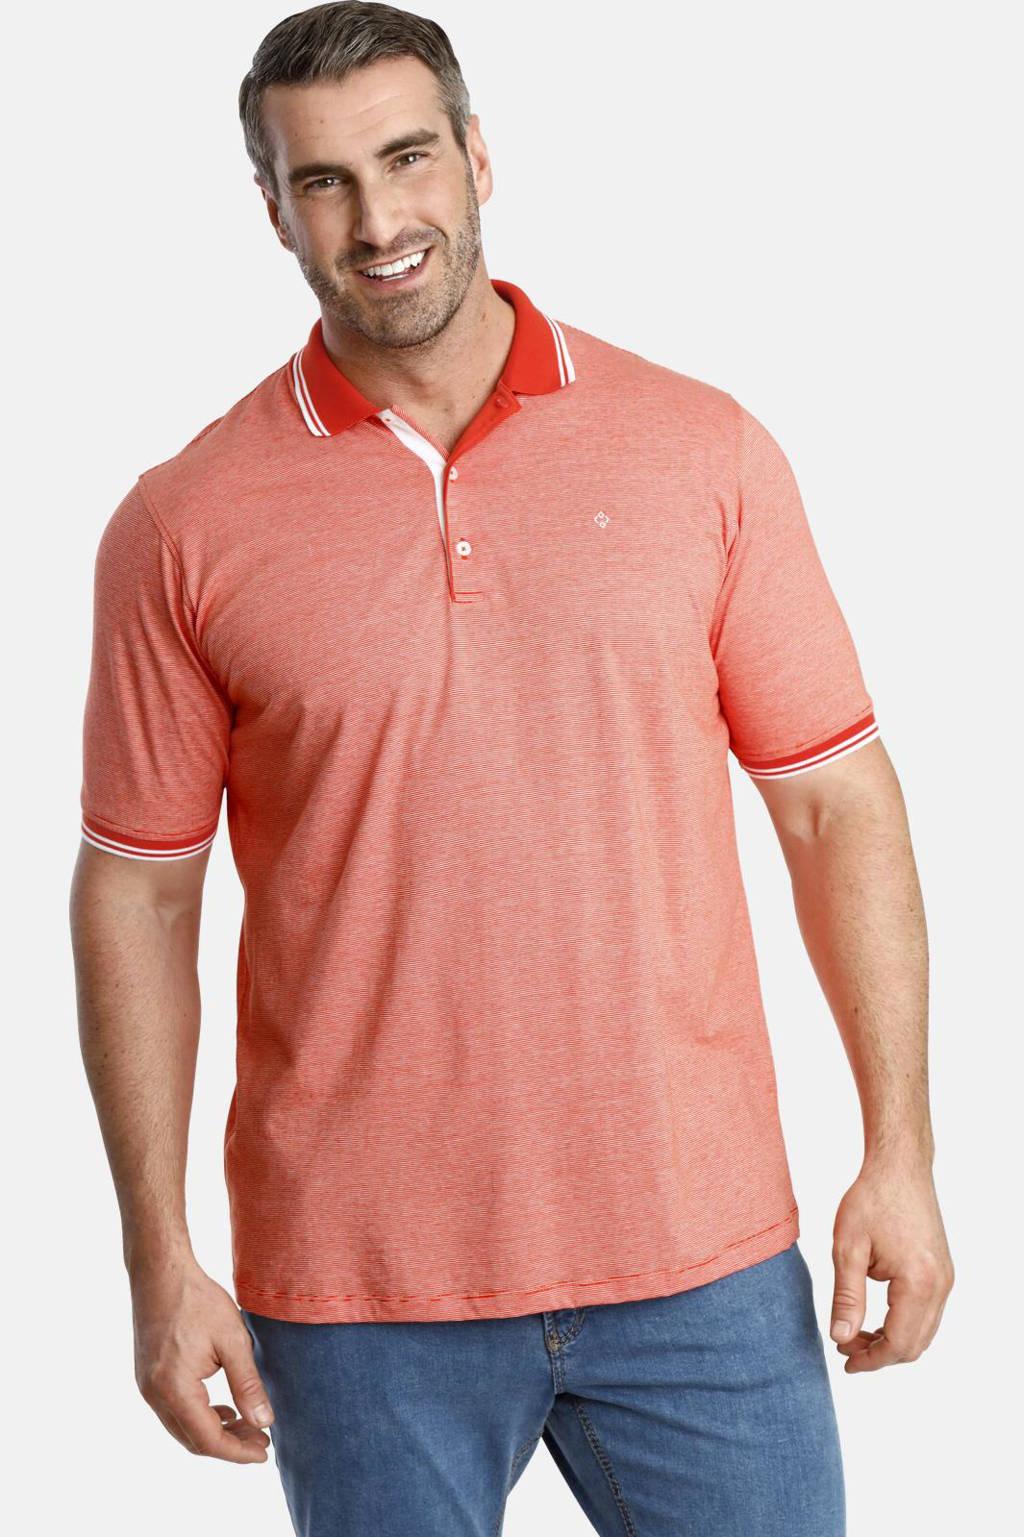 Charles Colby polo T-shirt Earl NICHOLAS Plus Size oranje, Oranje